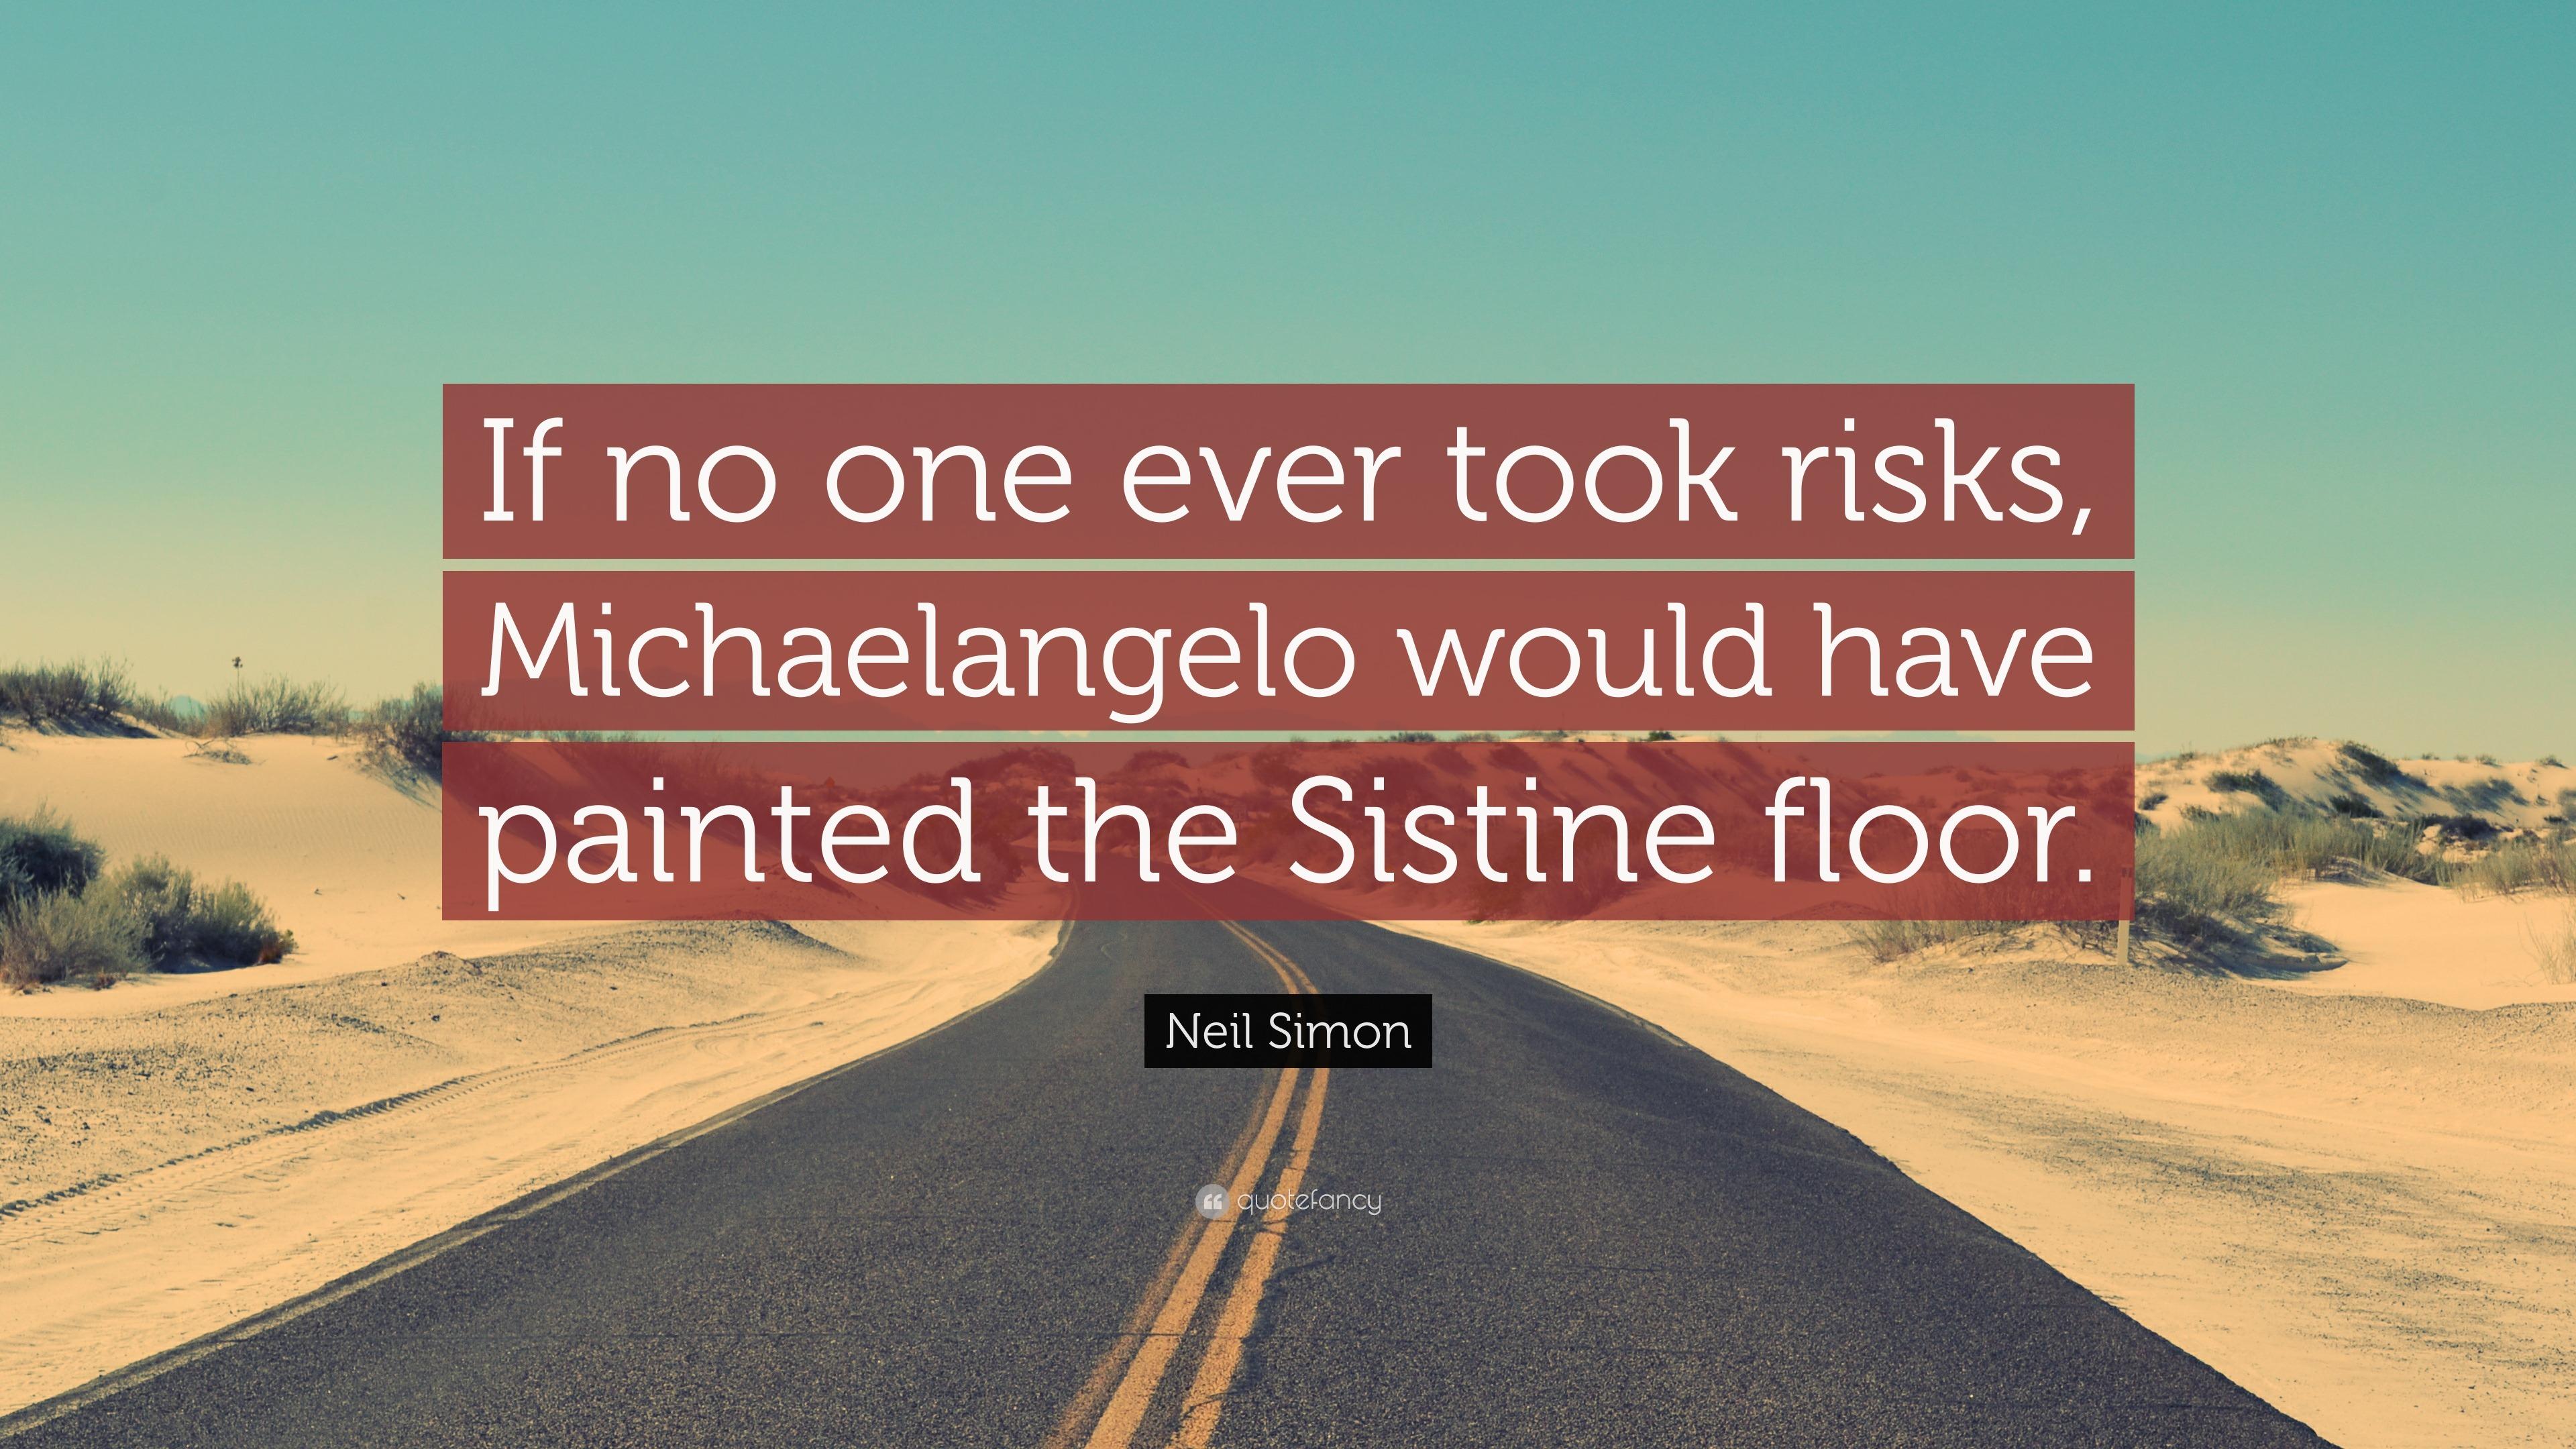 Neil Simon Quote If No One Ever Took Risks